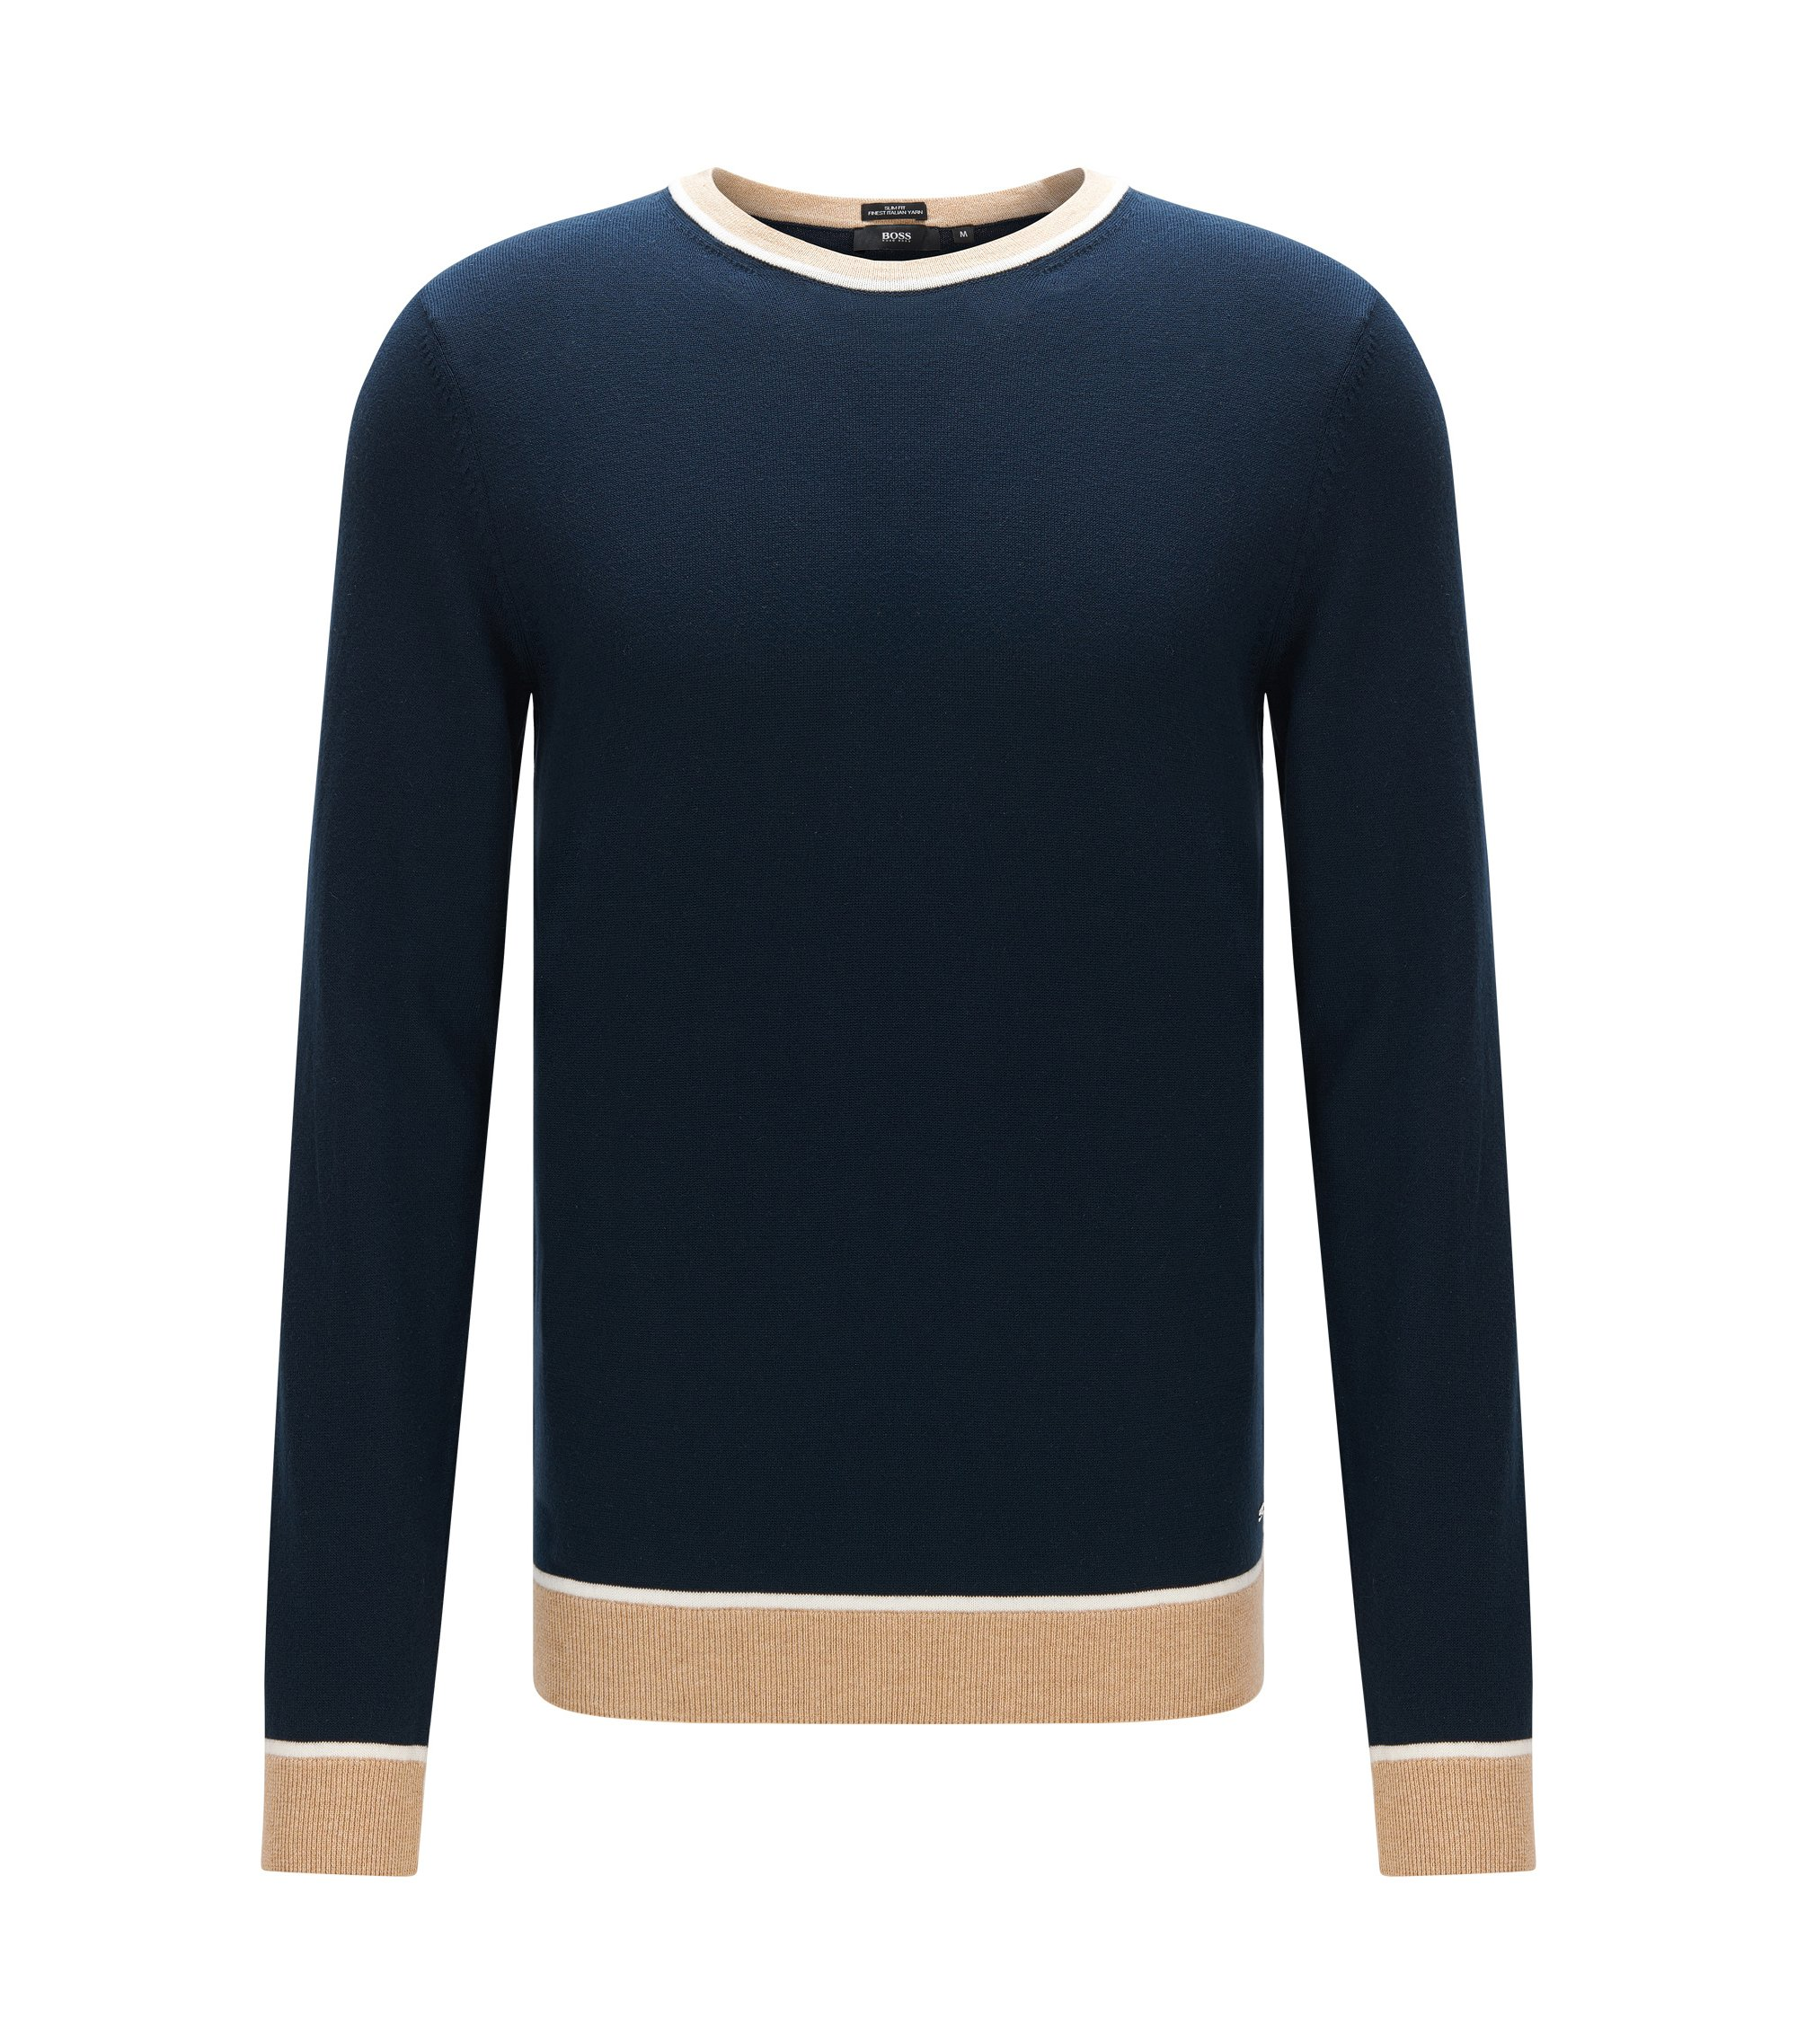 Colorblock Italian Cotton Sweater, Slim Fit | Marcelli, Dark Blue